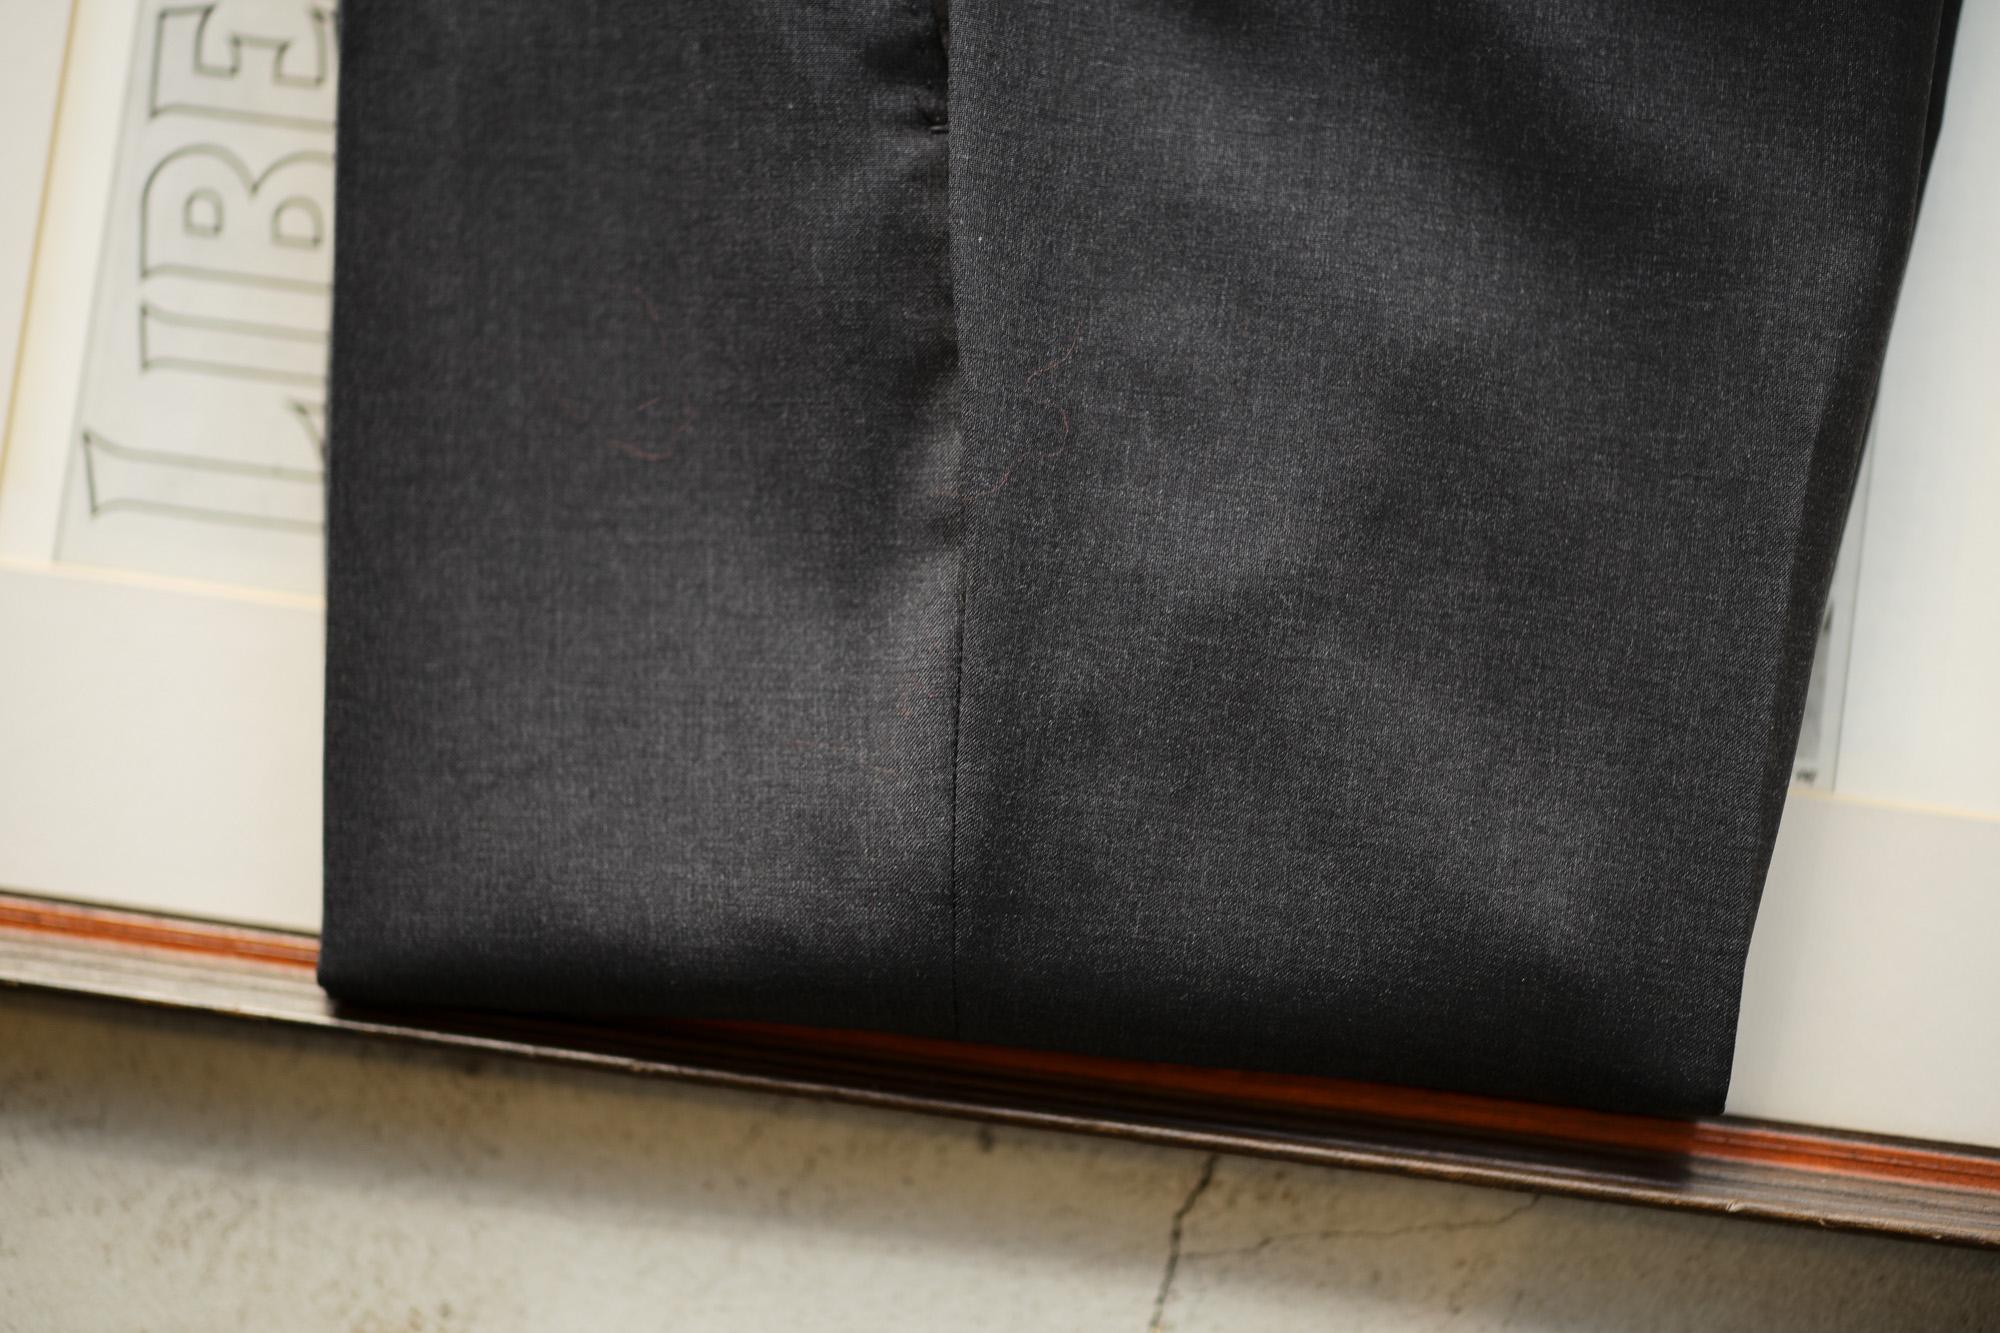 INCOTEX (インコテックス) N35 SLIM FIT (1NT035) SUPER 100'S YARN DYED TROPICAL トロピカルウール サマーウール スラックス CHARCOAL GRAY (チャコールグレー・935) 2019 春夏新作 愛知 名古屋 altoediritto アルトエデリット